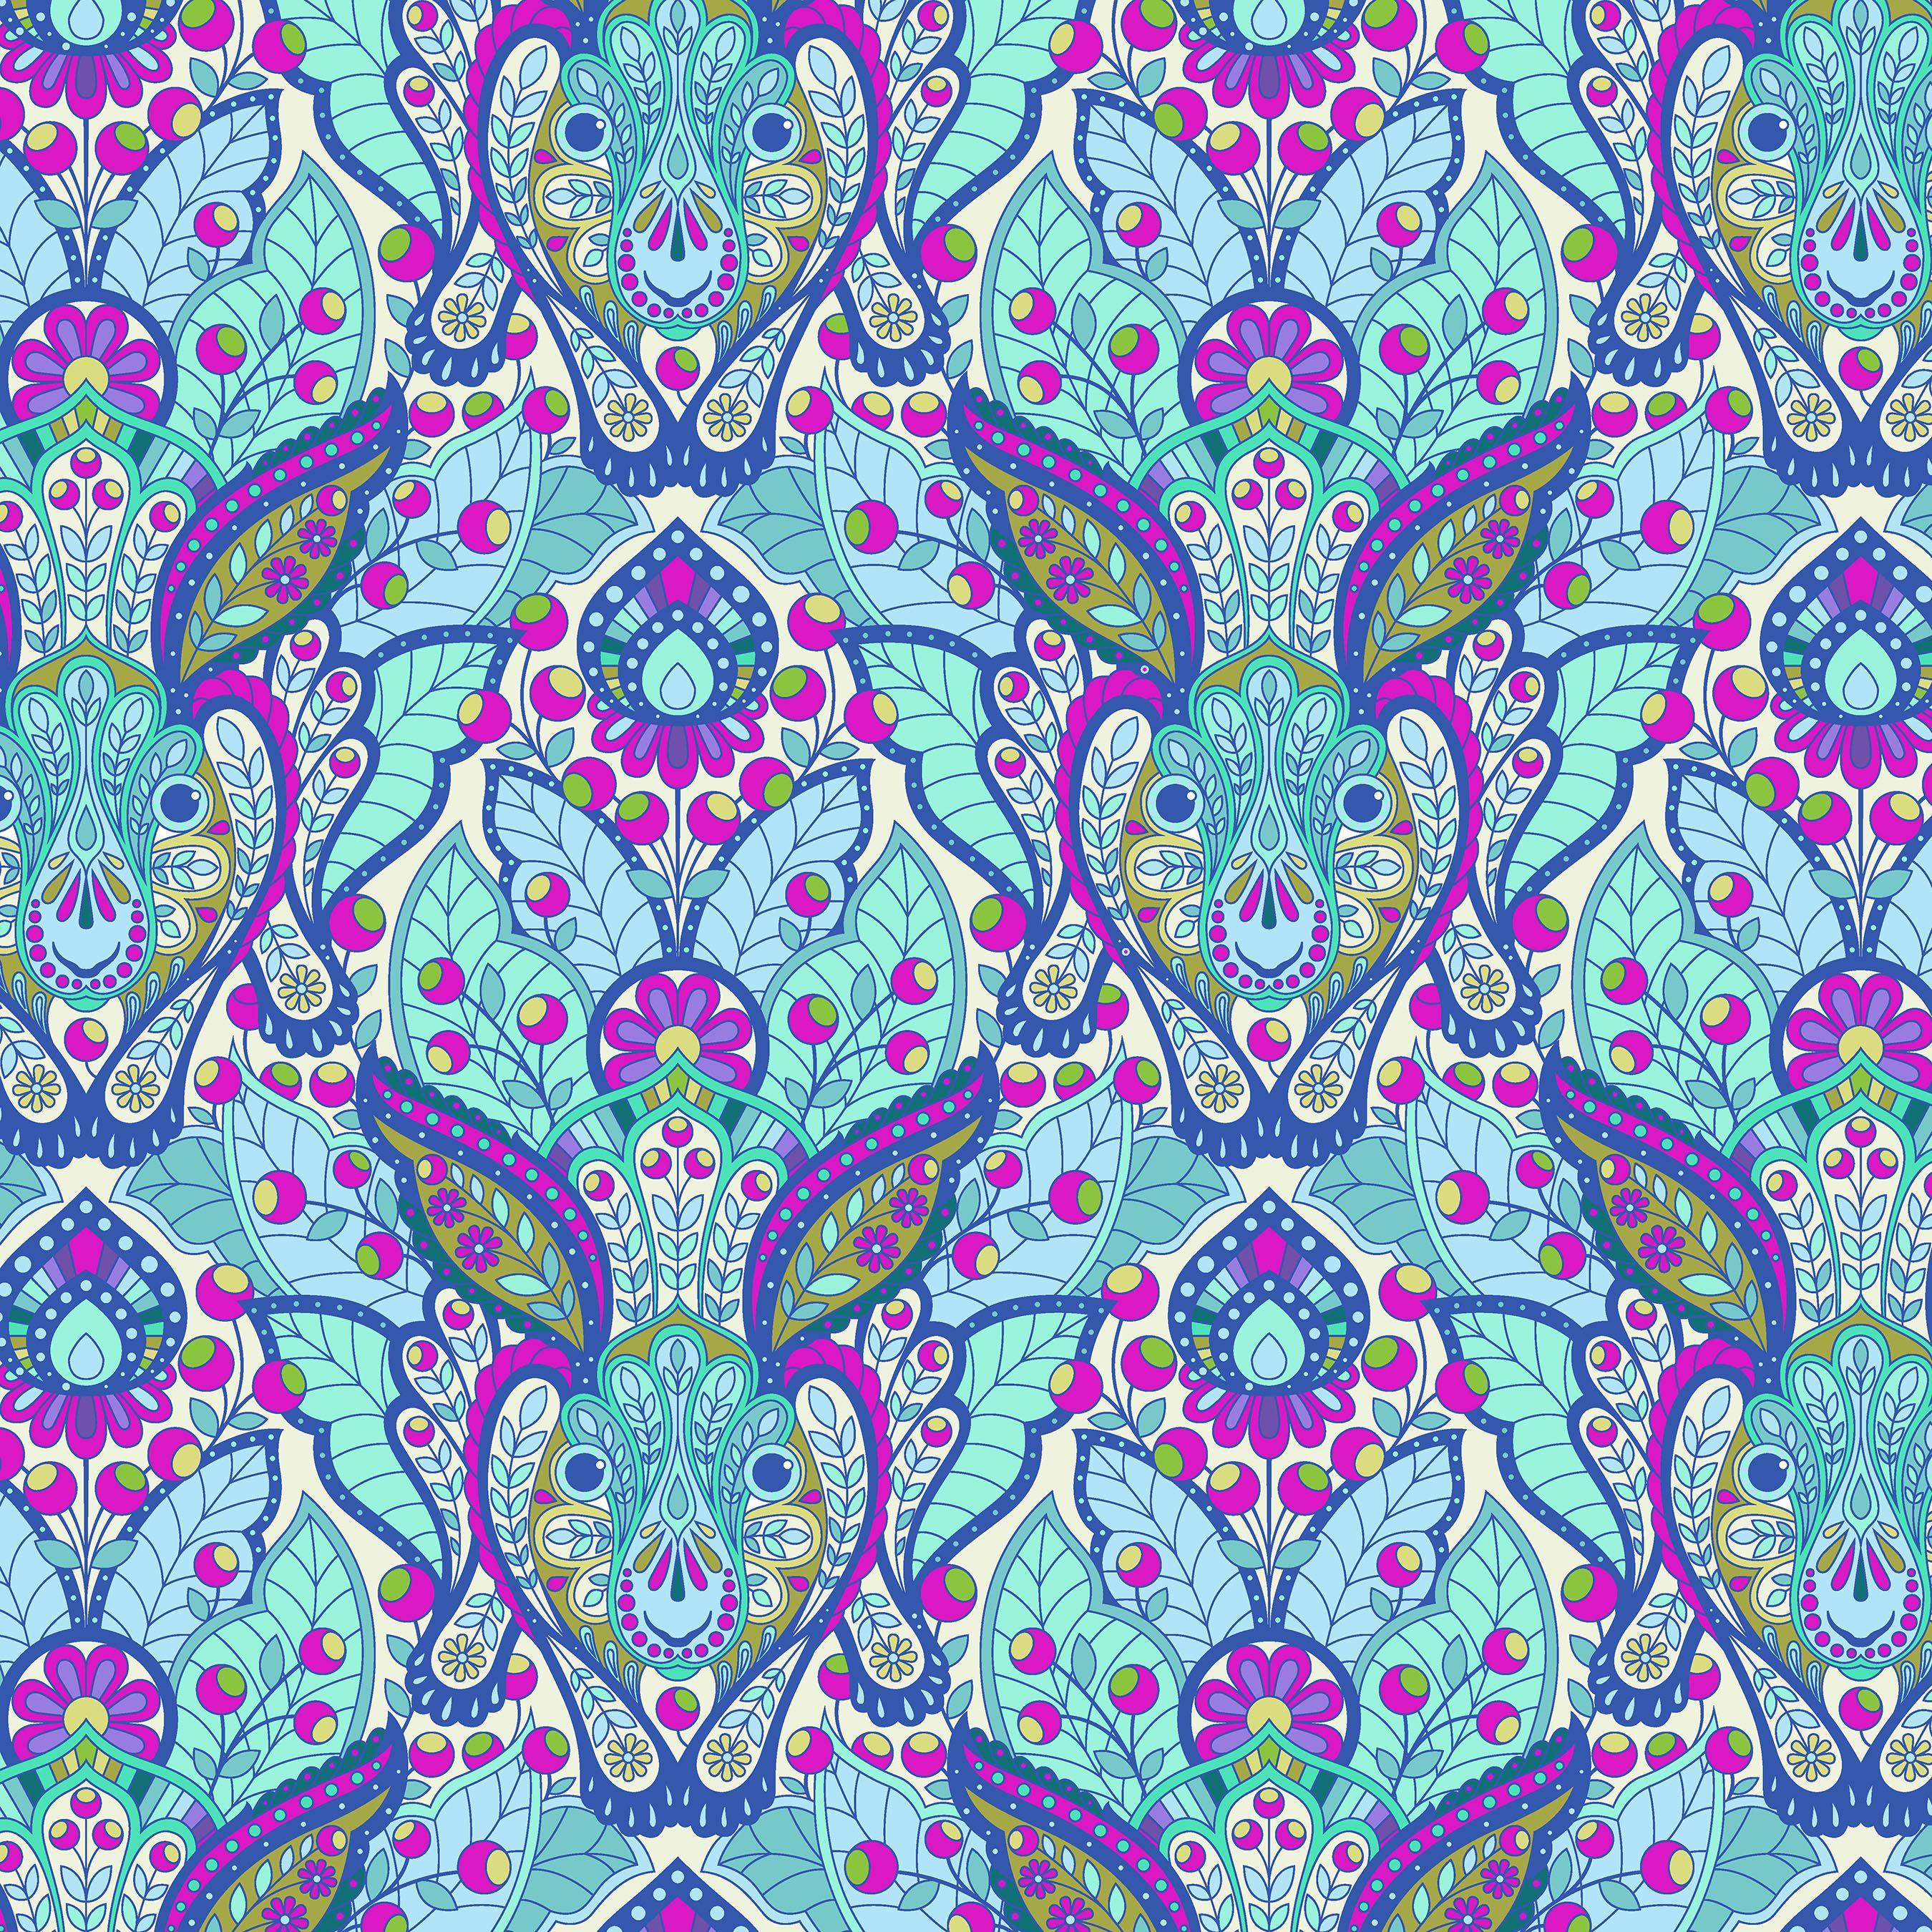 By 1//2 Yard ~ Free Spirit Tula Pink Fabric Slow /& Steady ~ Hare Blue Raspberry